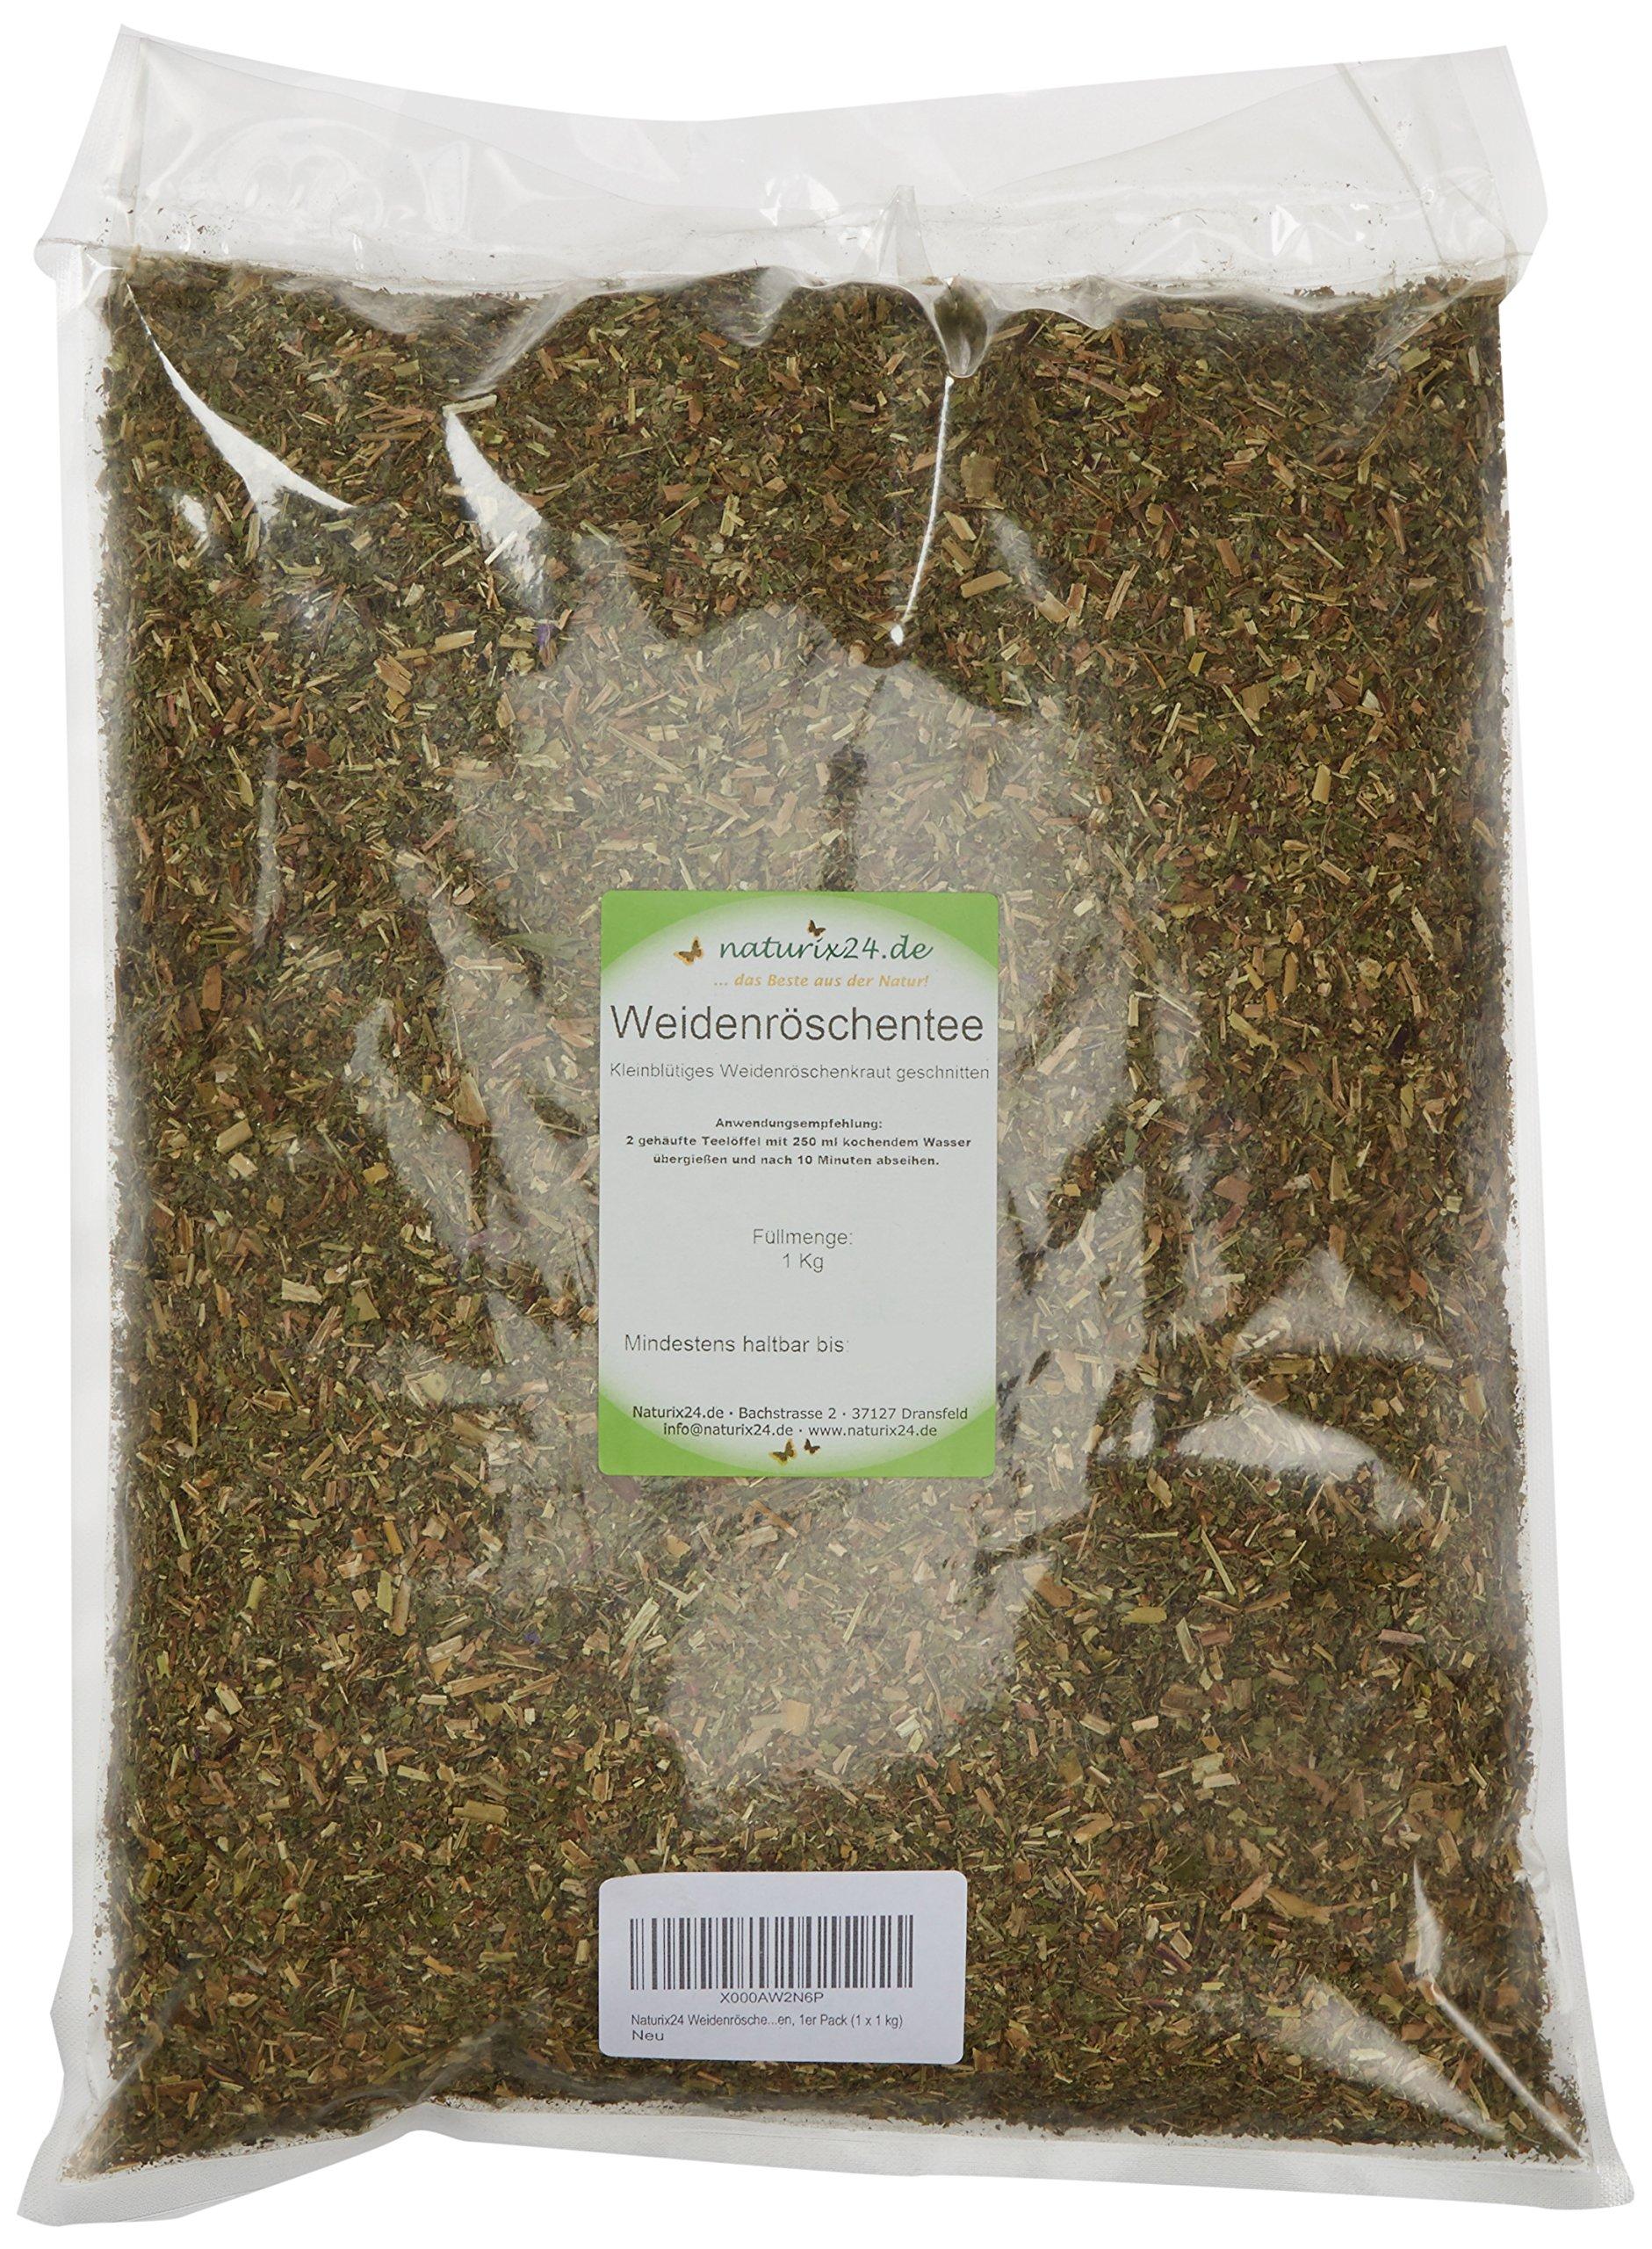 Naturix24-Weidenrschentee-Kleinbltiges-Weidenrschenkraut-geschnitten-1er-Pack-1-x-1-kg